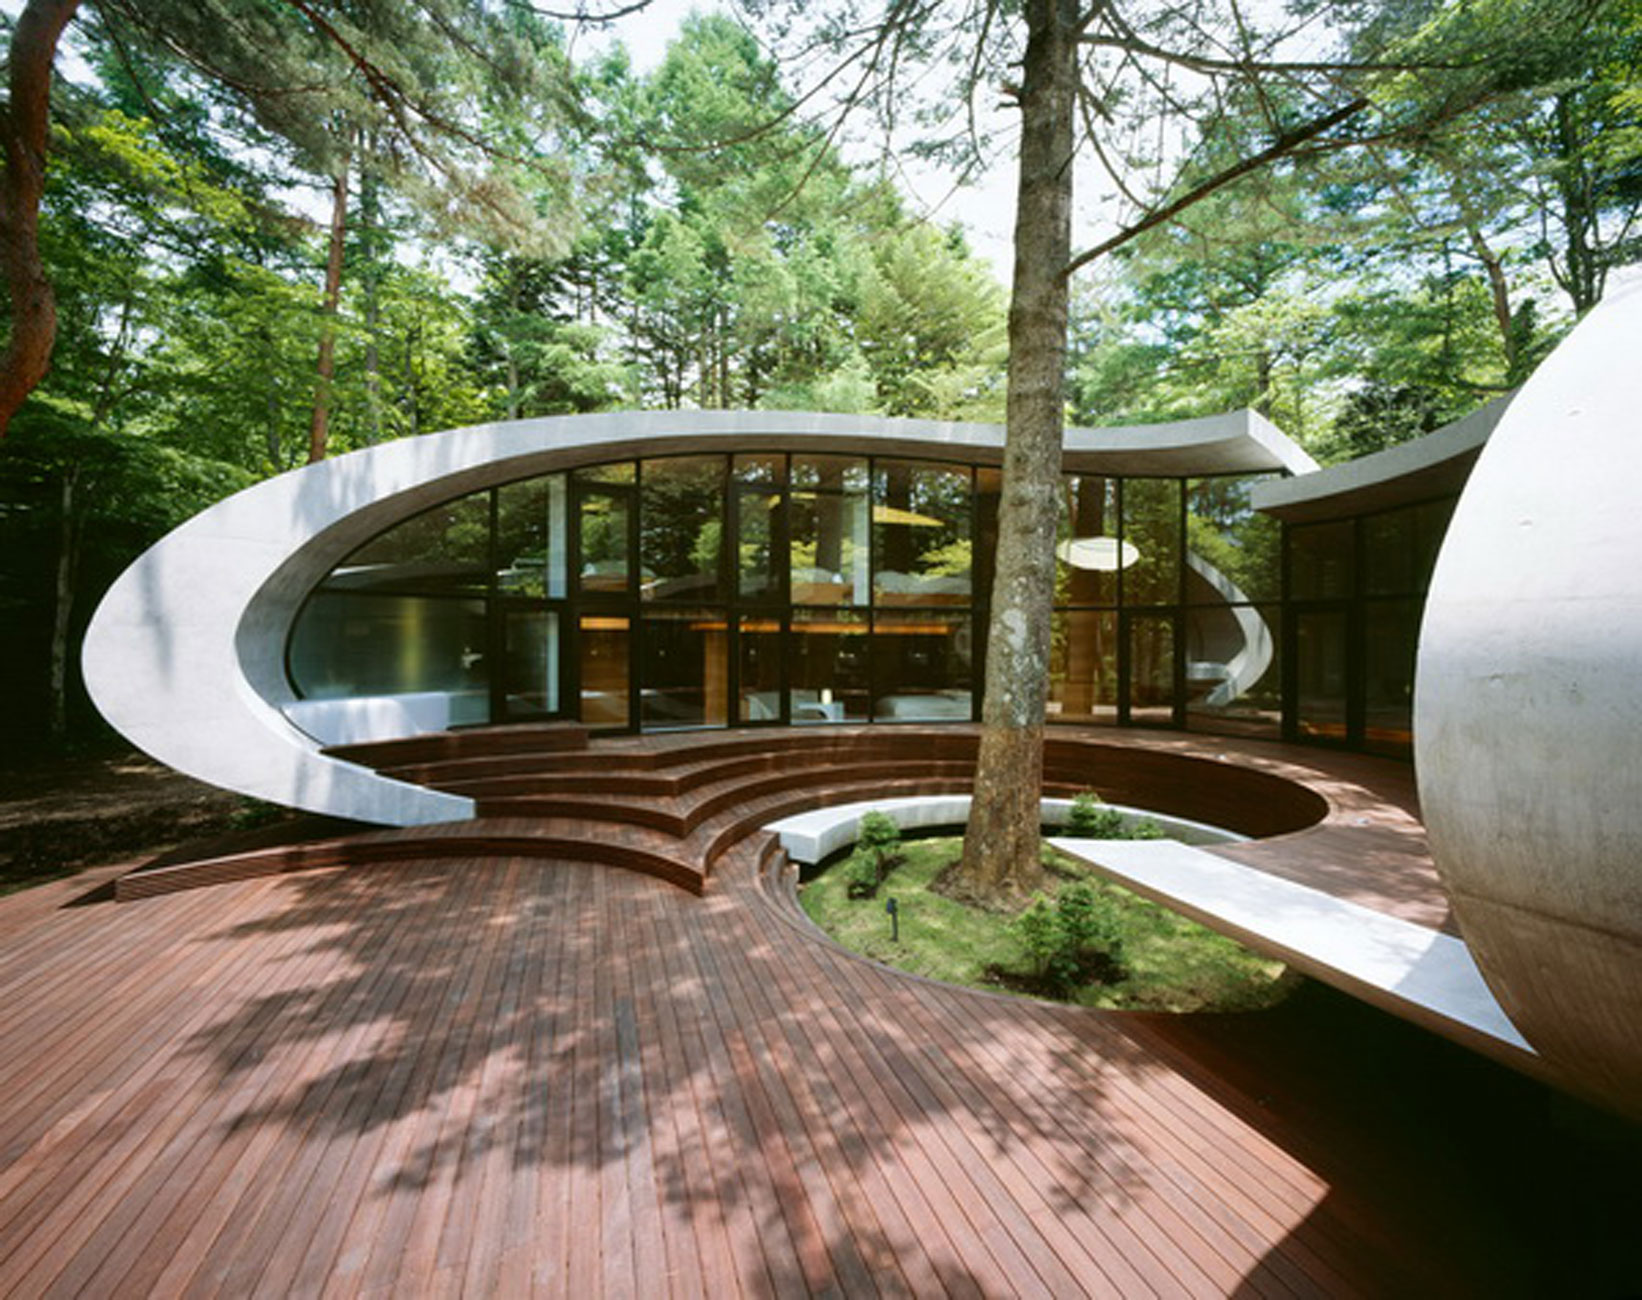 Home Design With Garden garden house design – home design and decorating